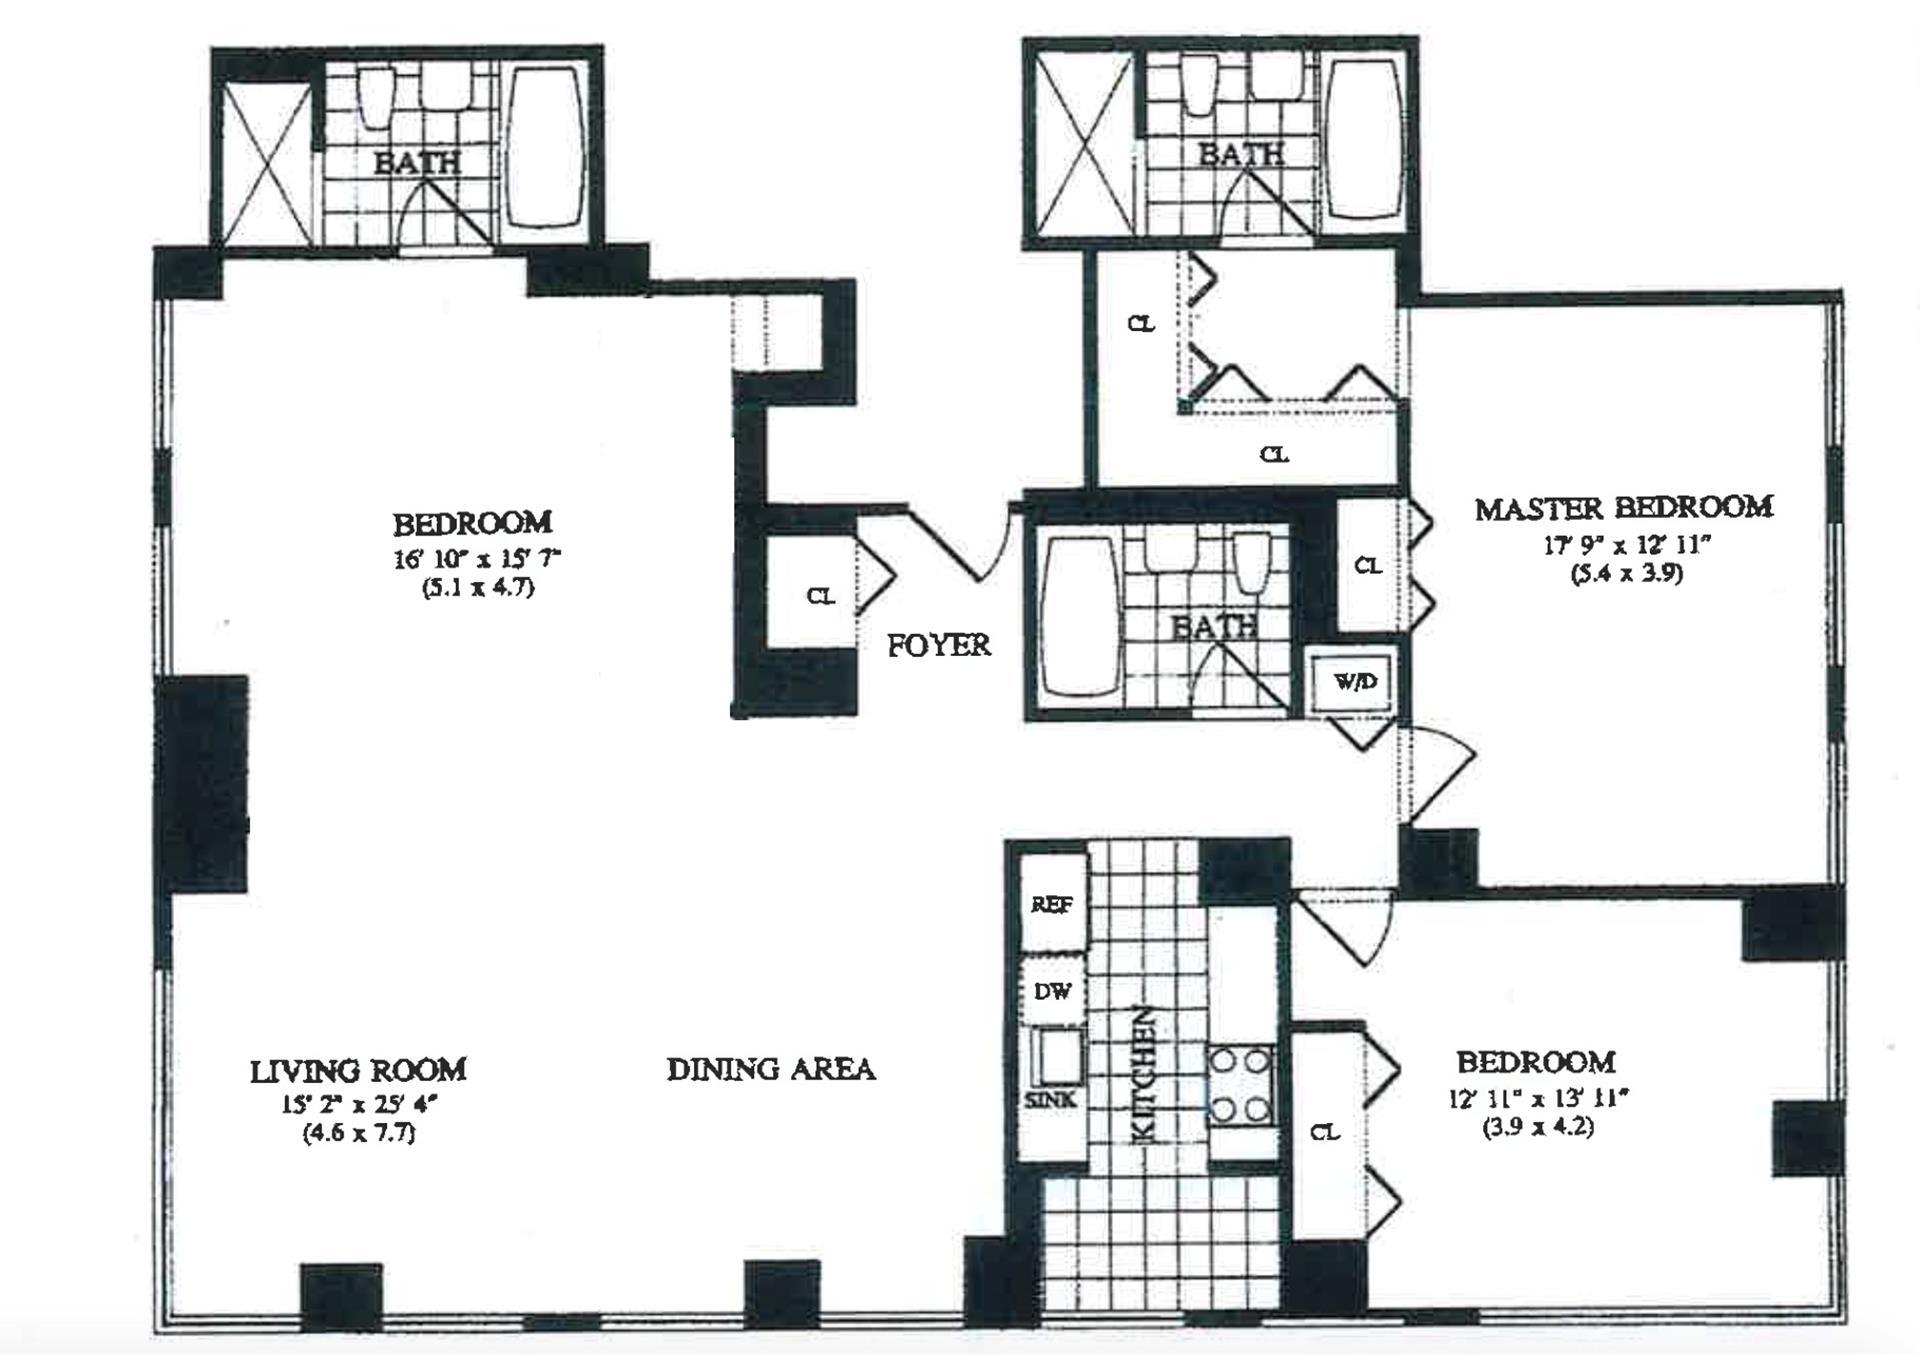 Floor plan of The Mondrian, 250 East 54th St, 35D - Midtown, New York